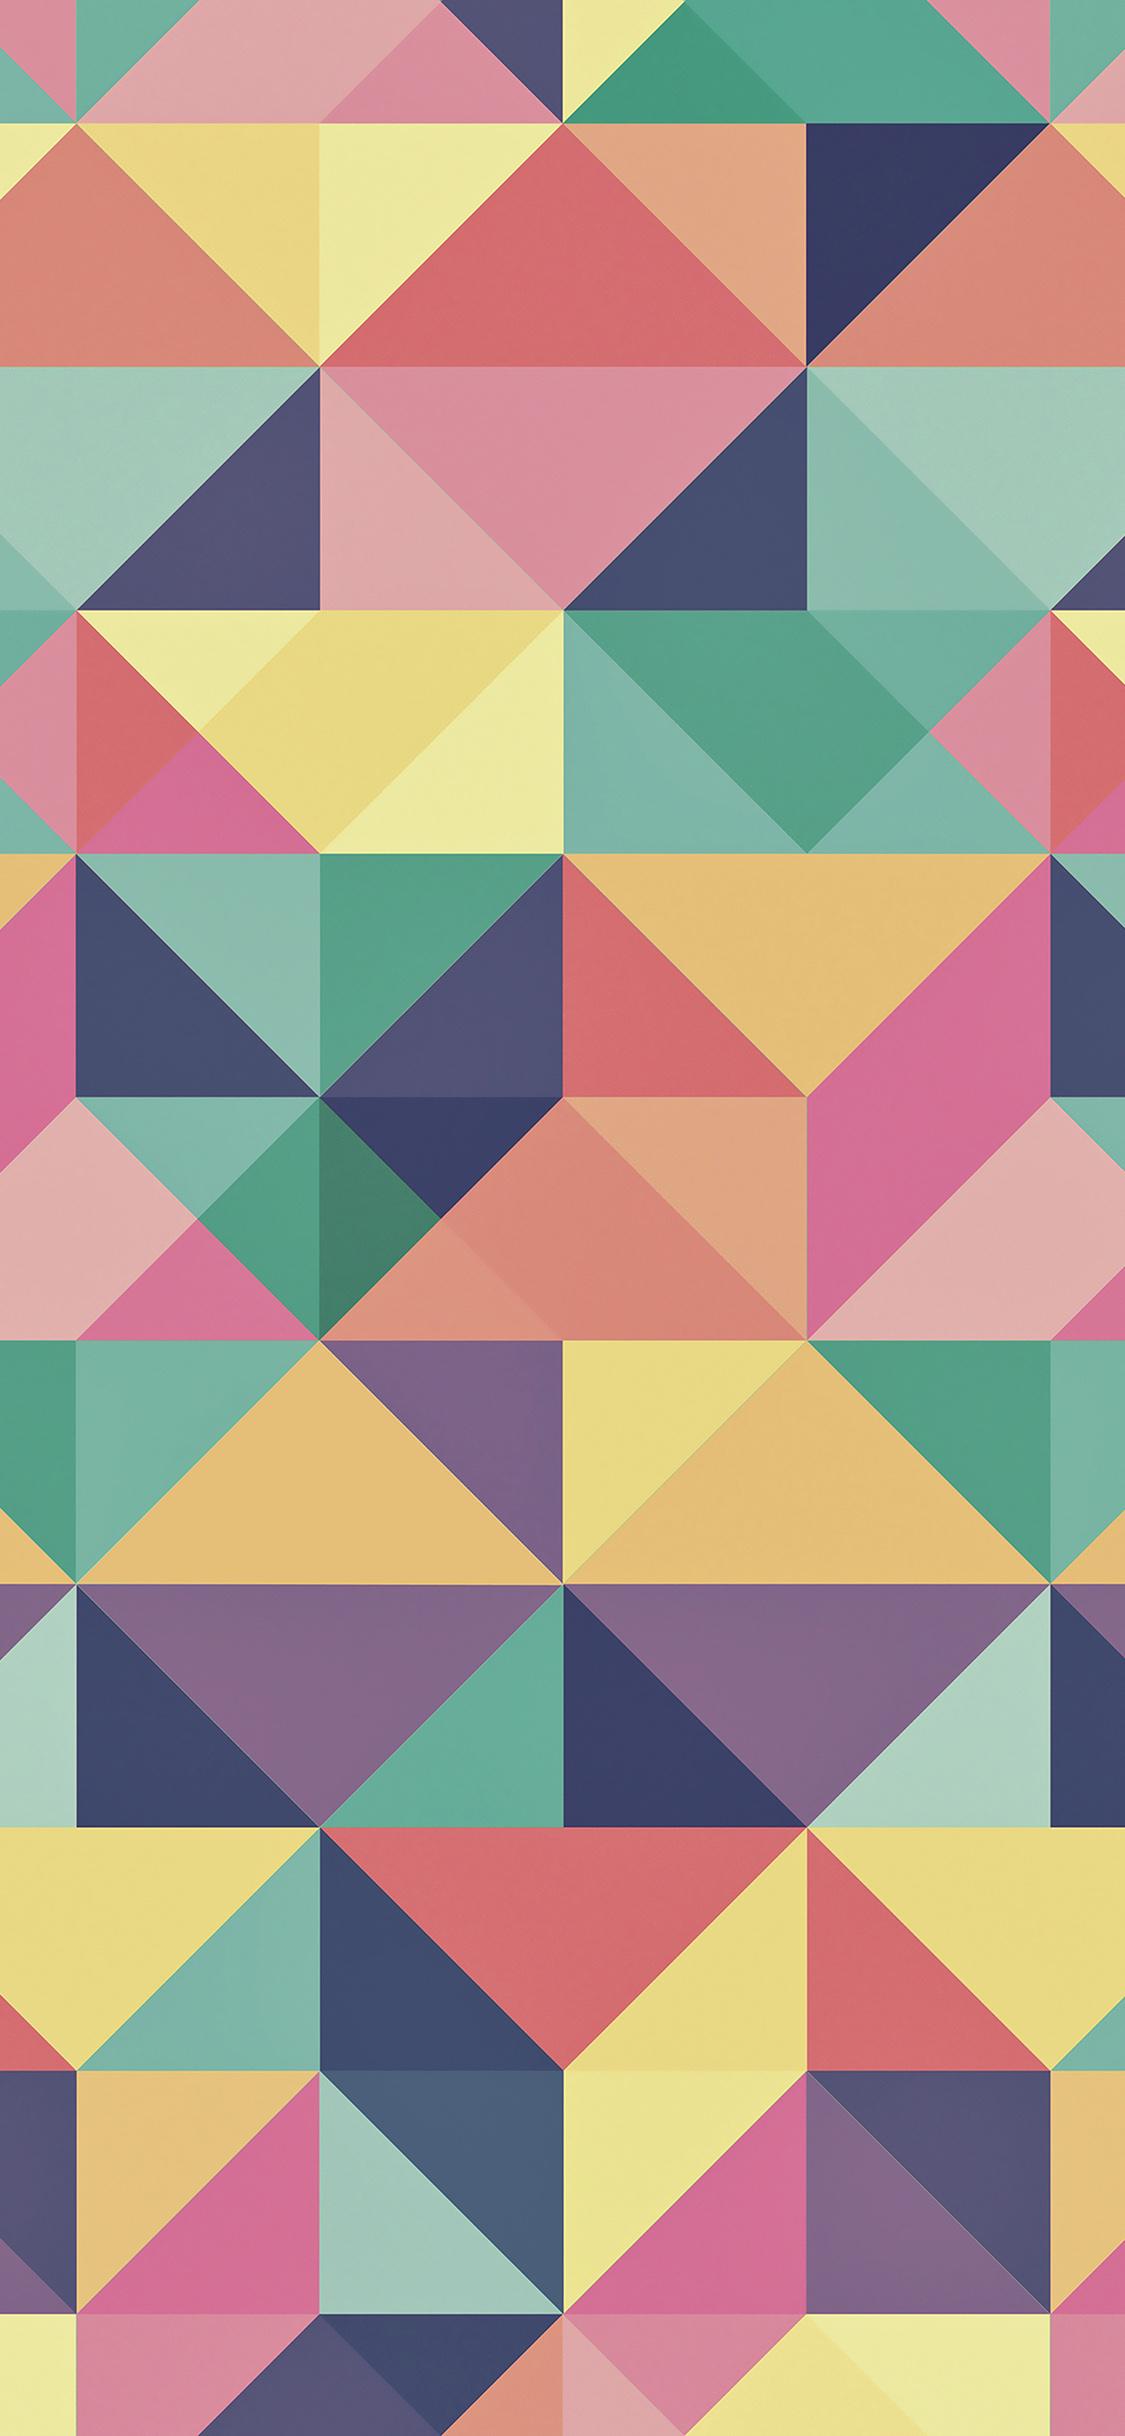 iPhoneXpapers.com-Apple-iPhone-wallpaper-vp25-abstract-polygon-art-pattern-rainbow